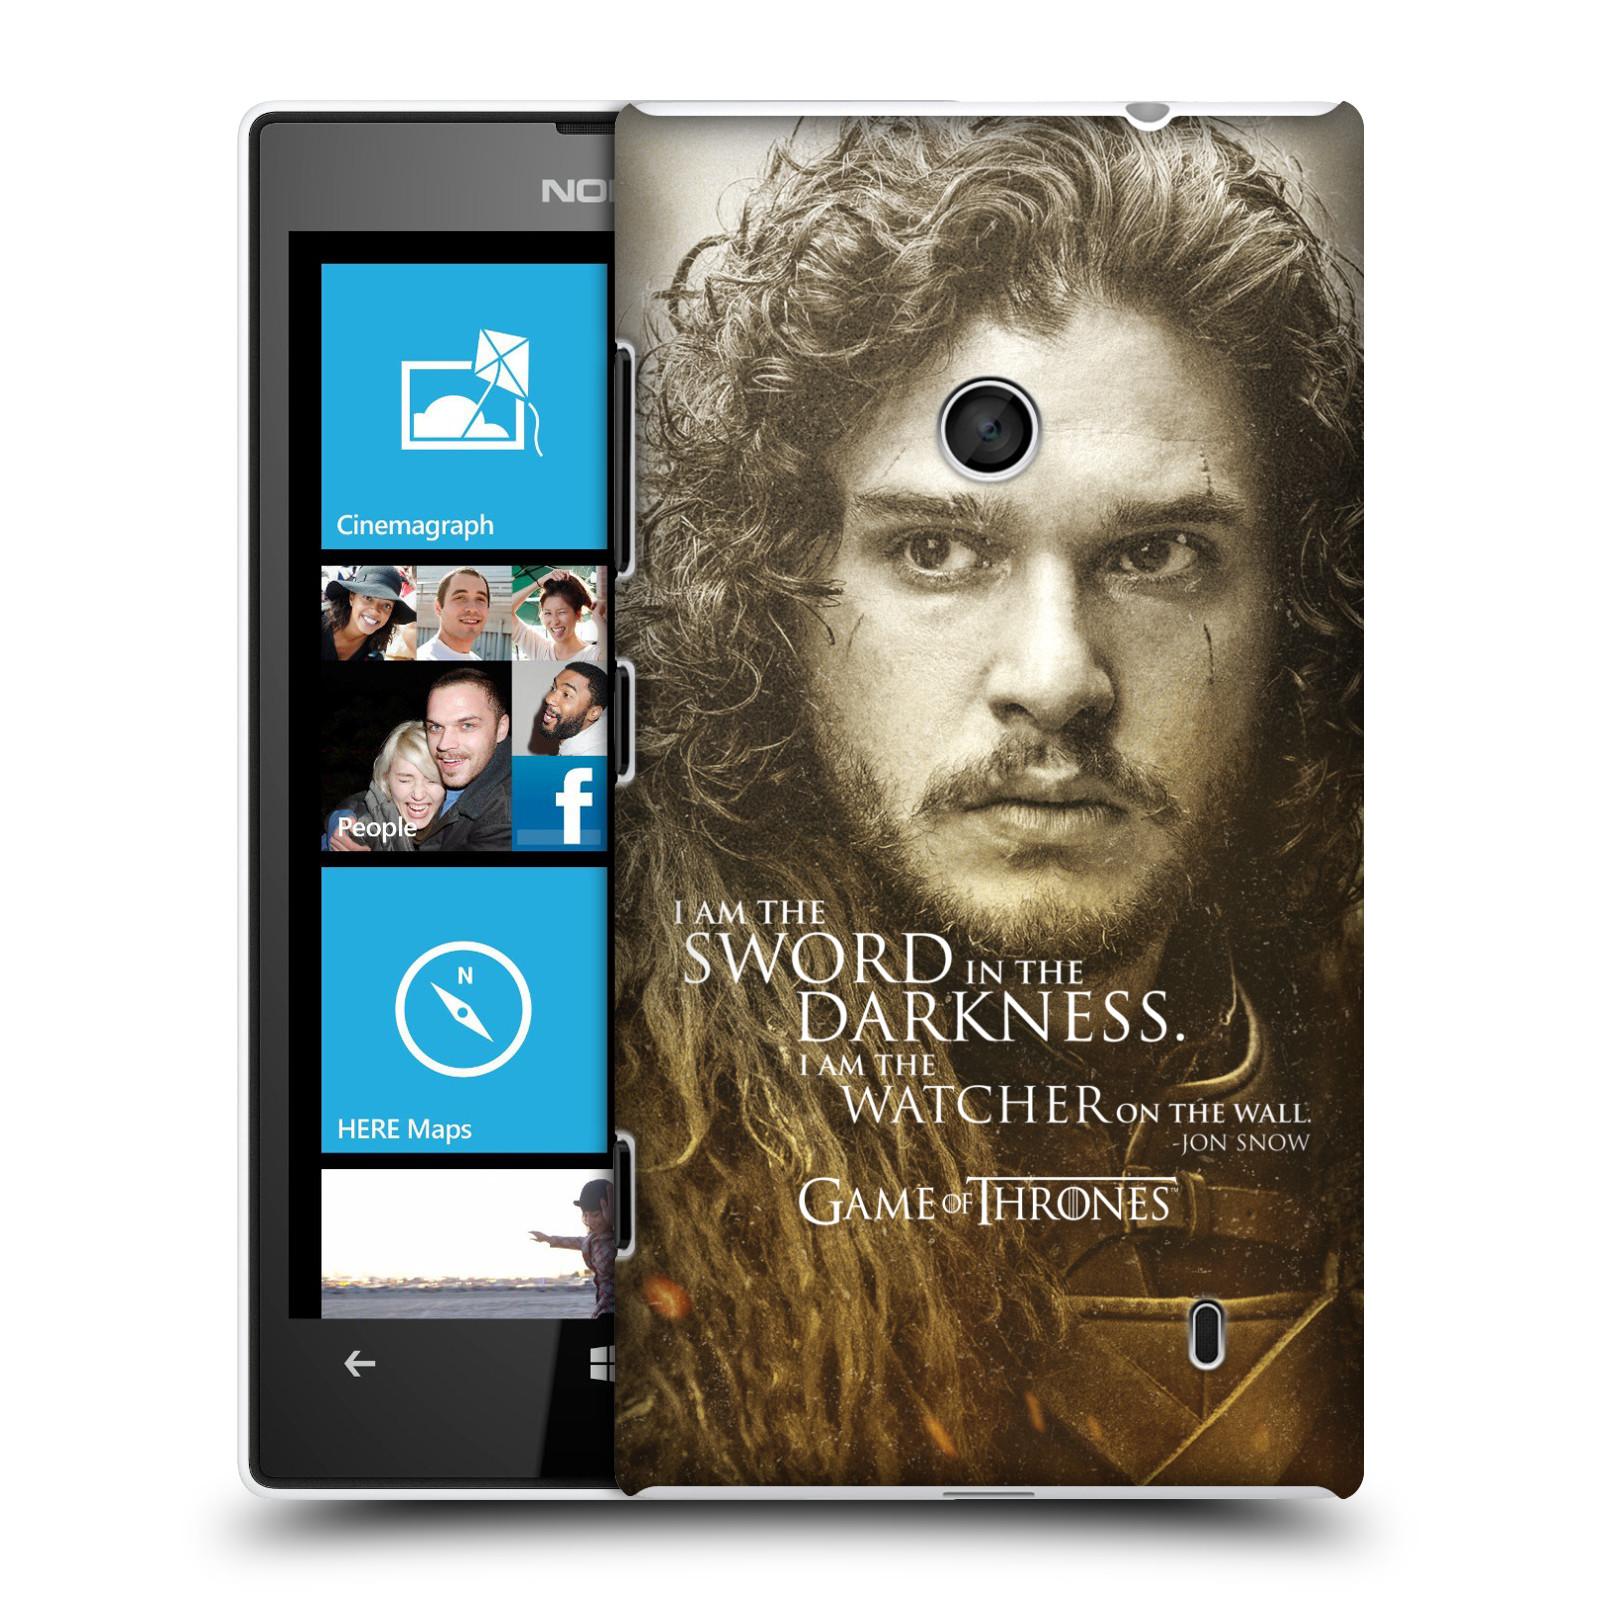 Plastové pouzdro na mobil Nokia Lumia 520 HEAD CASE Hra o trůny - Jon Snow (Plastový kryt či obal na mobilní telefon s licencovaným motivem Hra o trůny - Game Of Thrones pro Nokia Lumia 520 )